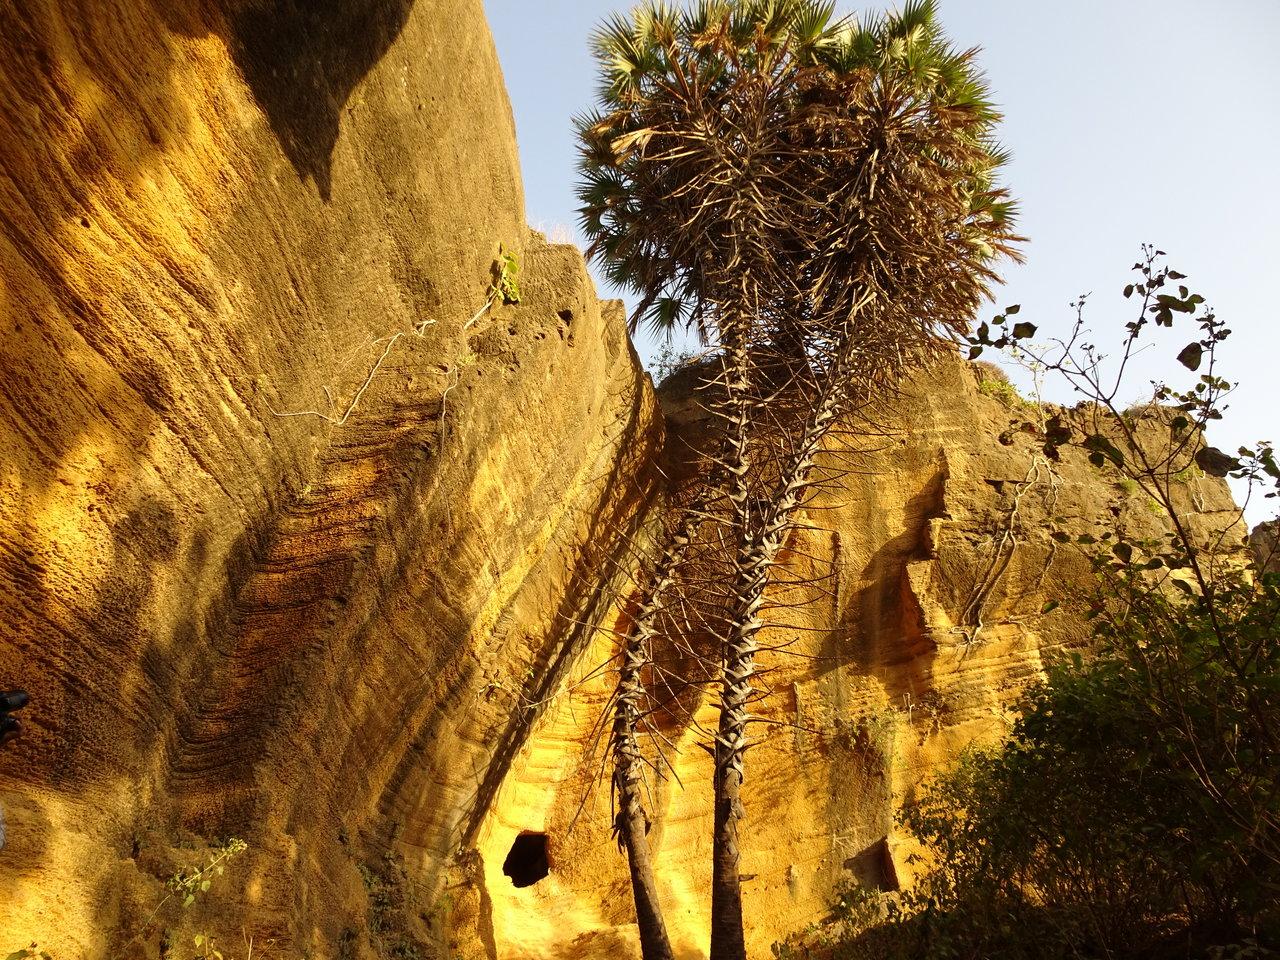 Naida caves - Hoka trees native to Diu